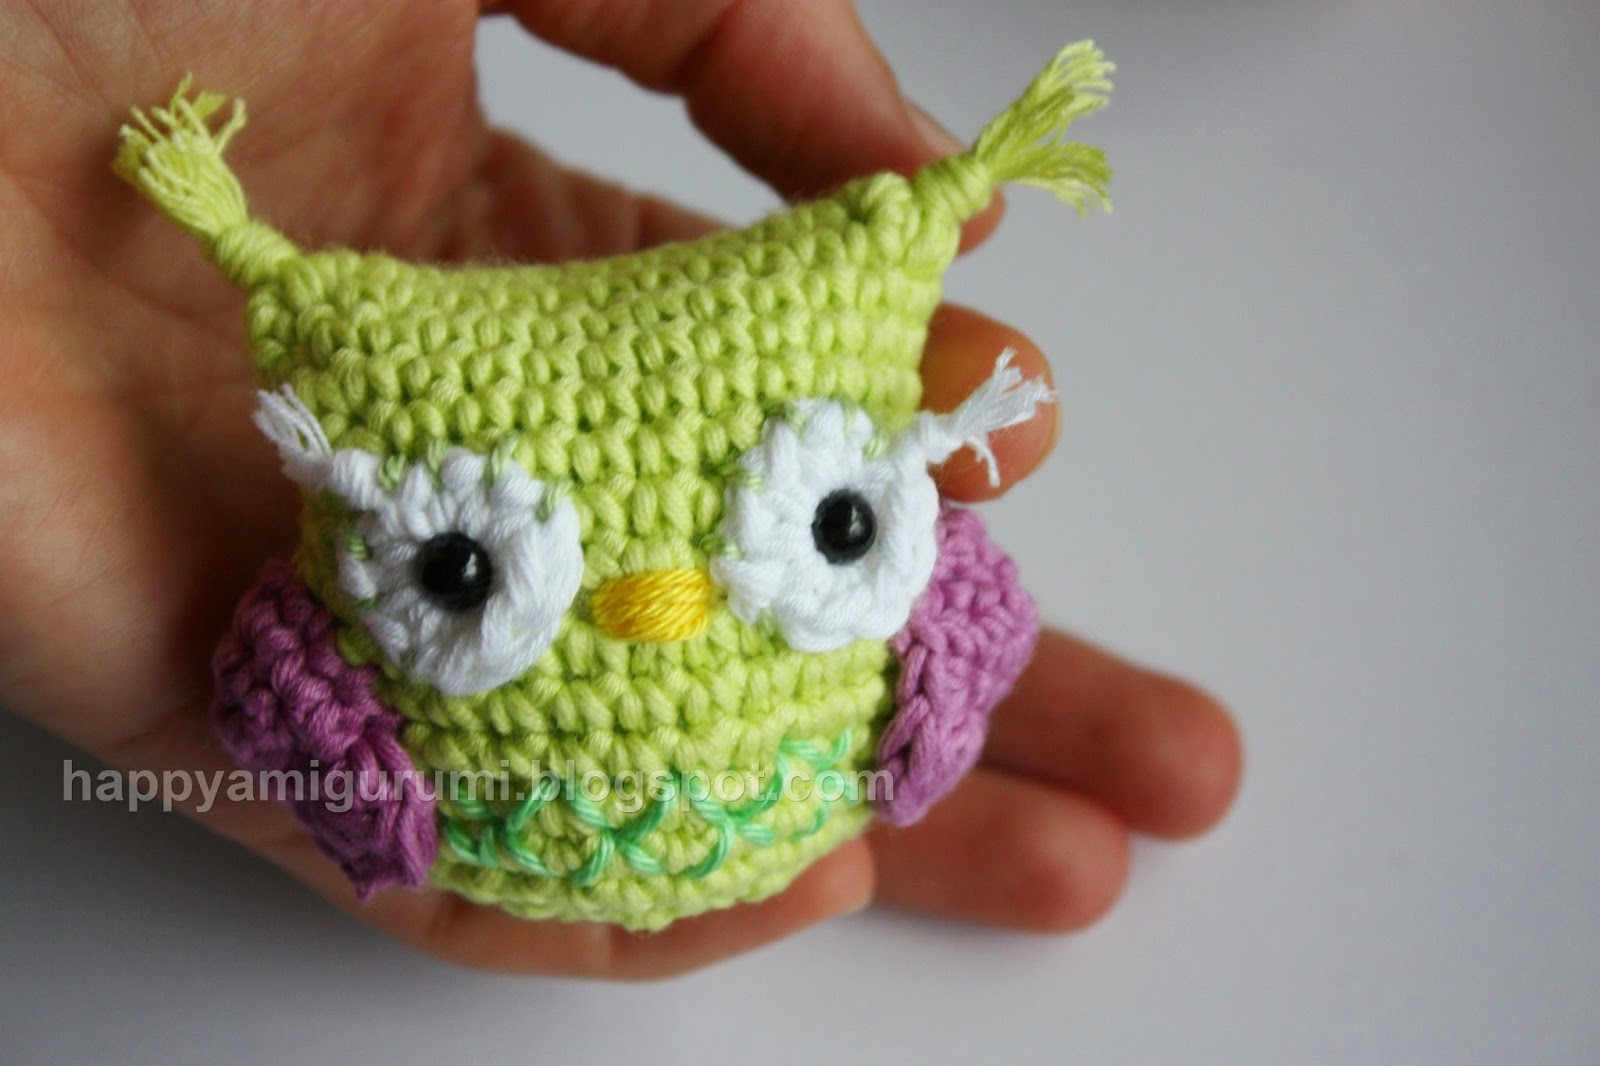 Amigurumi Owl Crochet Patterns Free : Happyamigurumi free amigurumi pattern owl